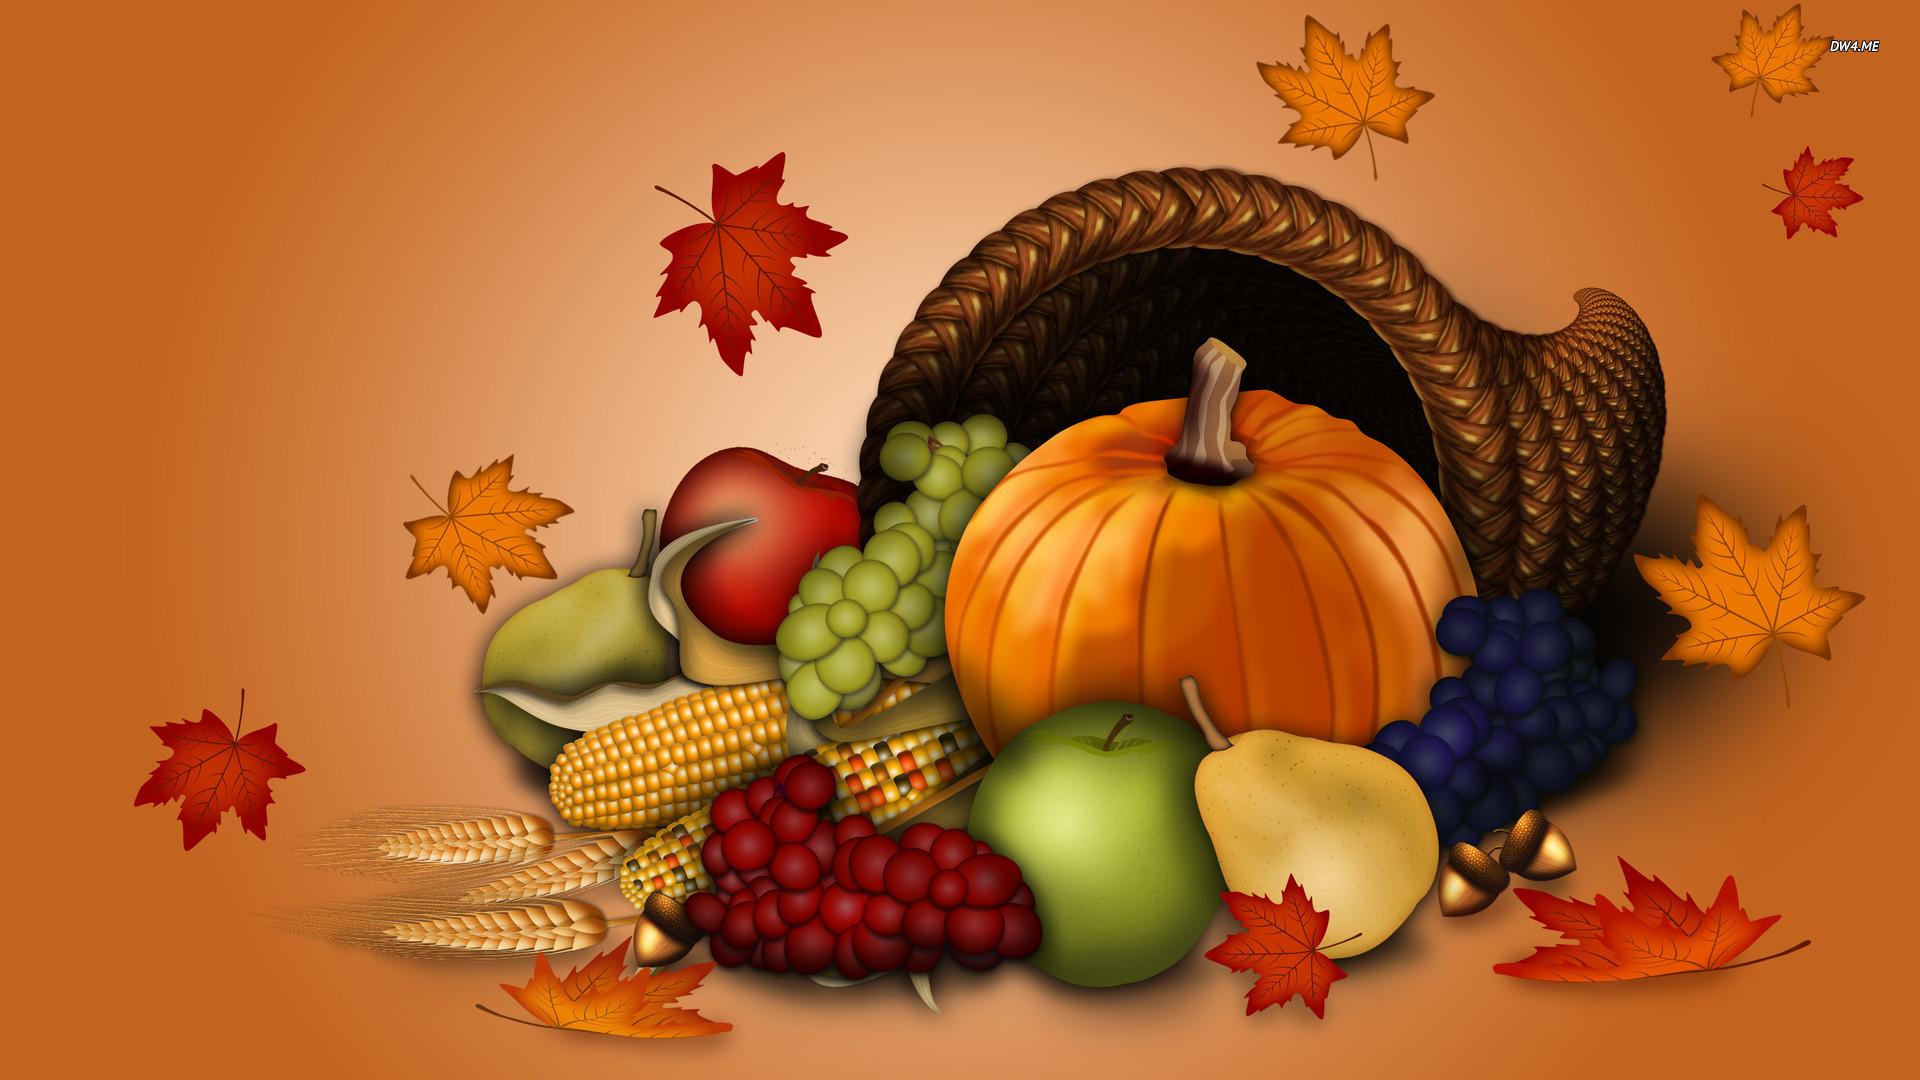 Thanksgiving wallpaper background   SF Wallpaper 1920x1080